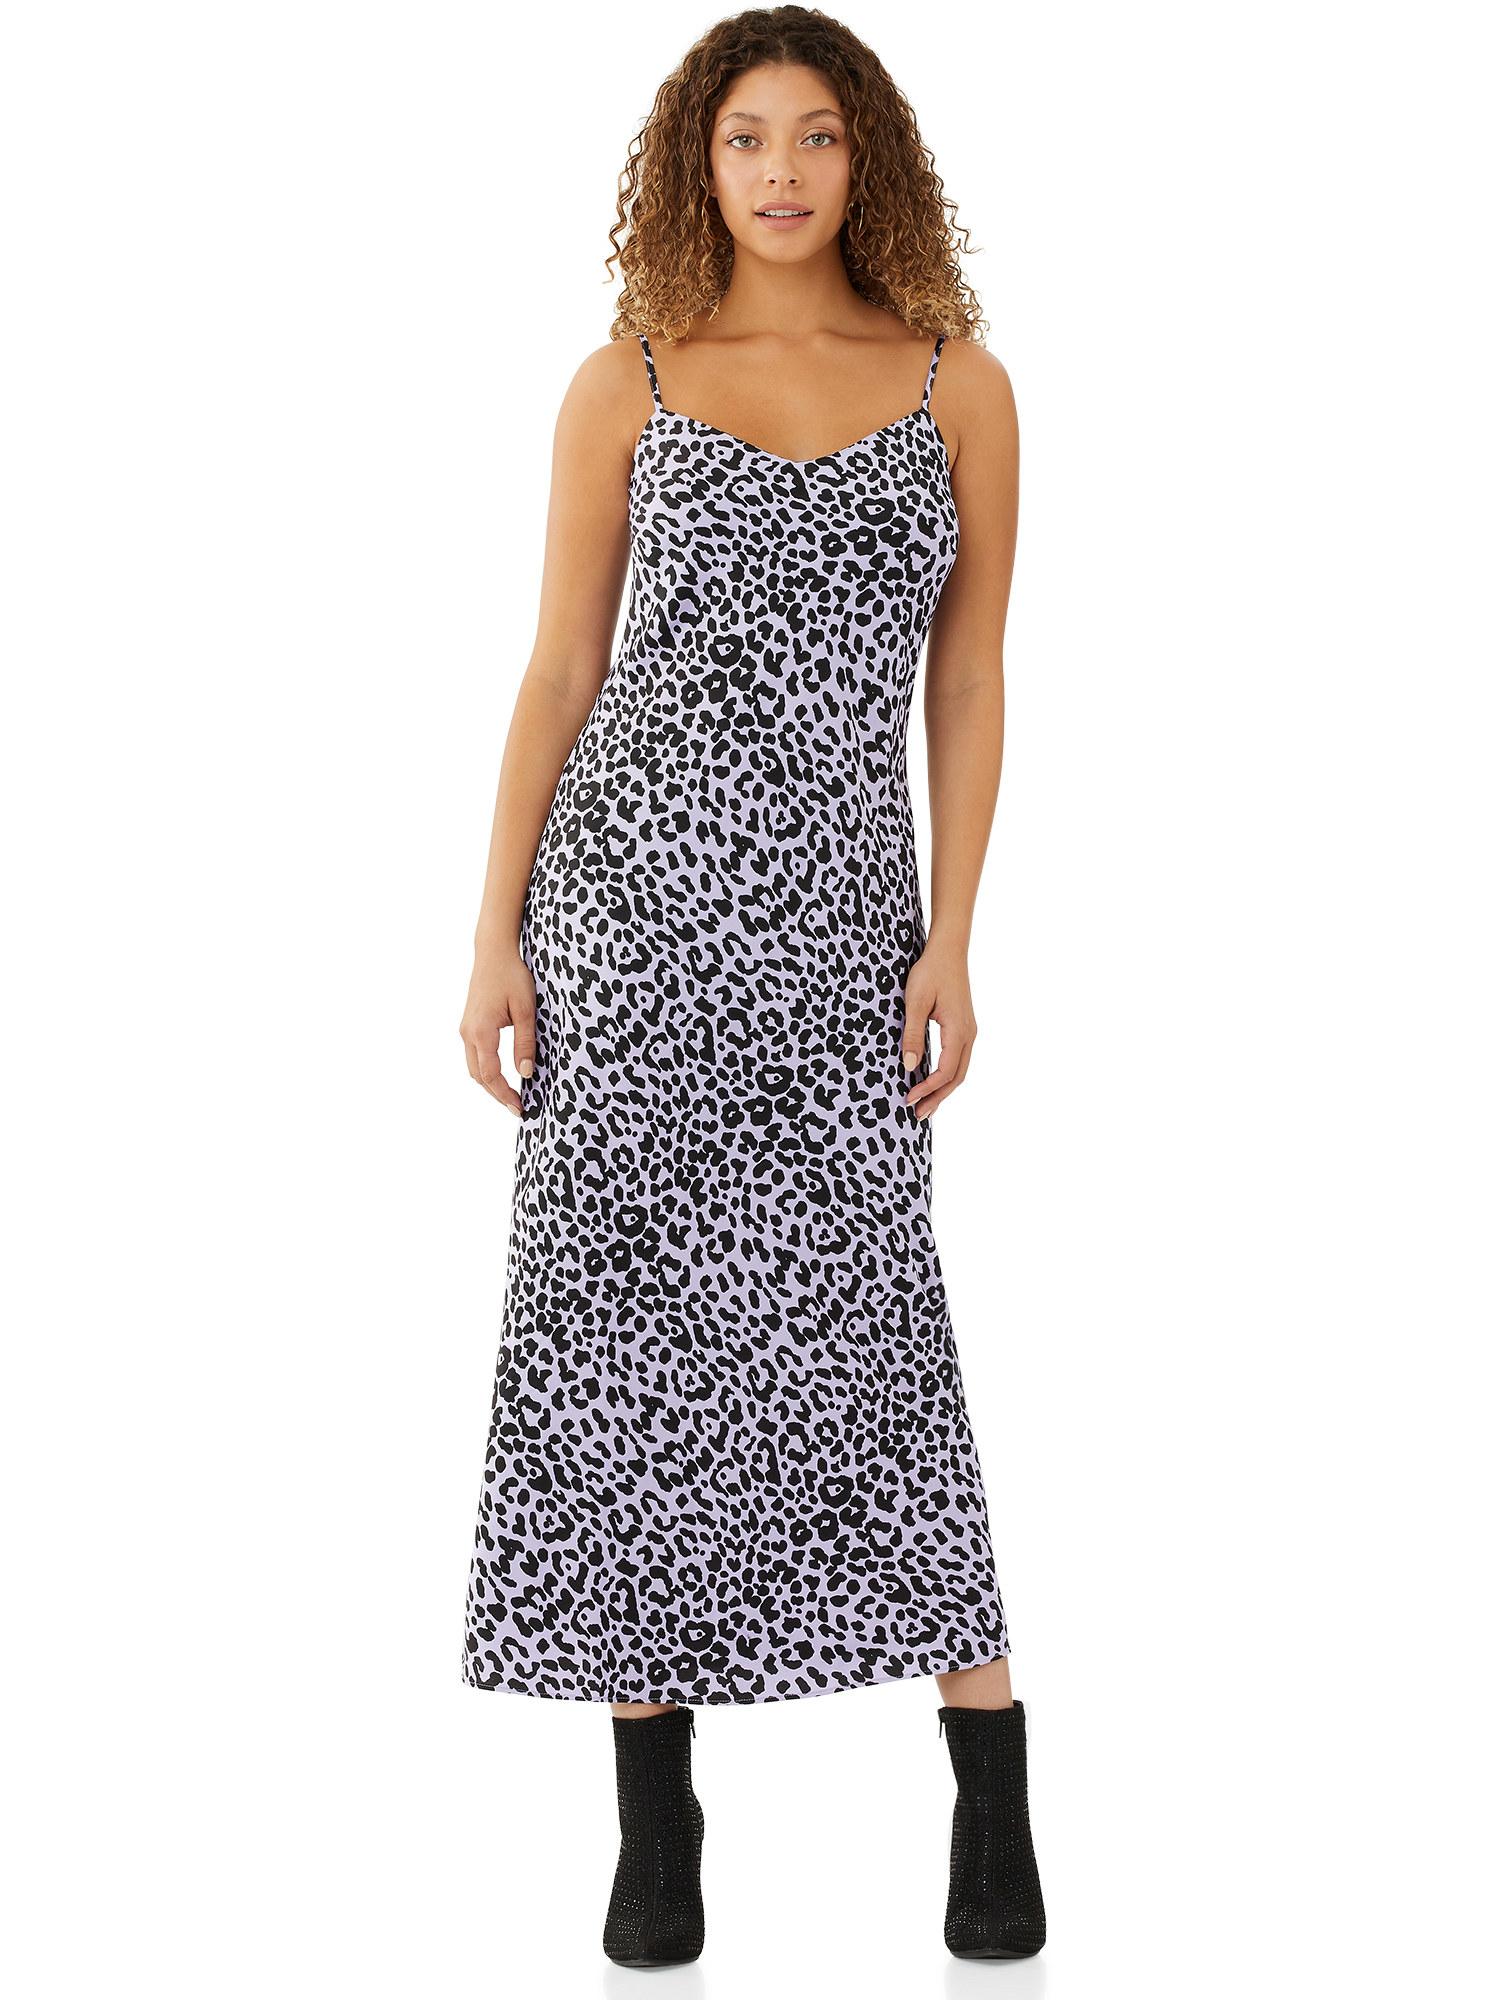 Model wearing purple animal print dress